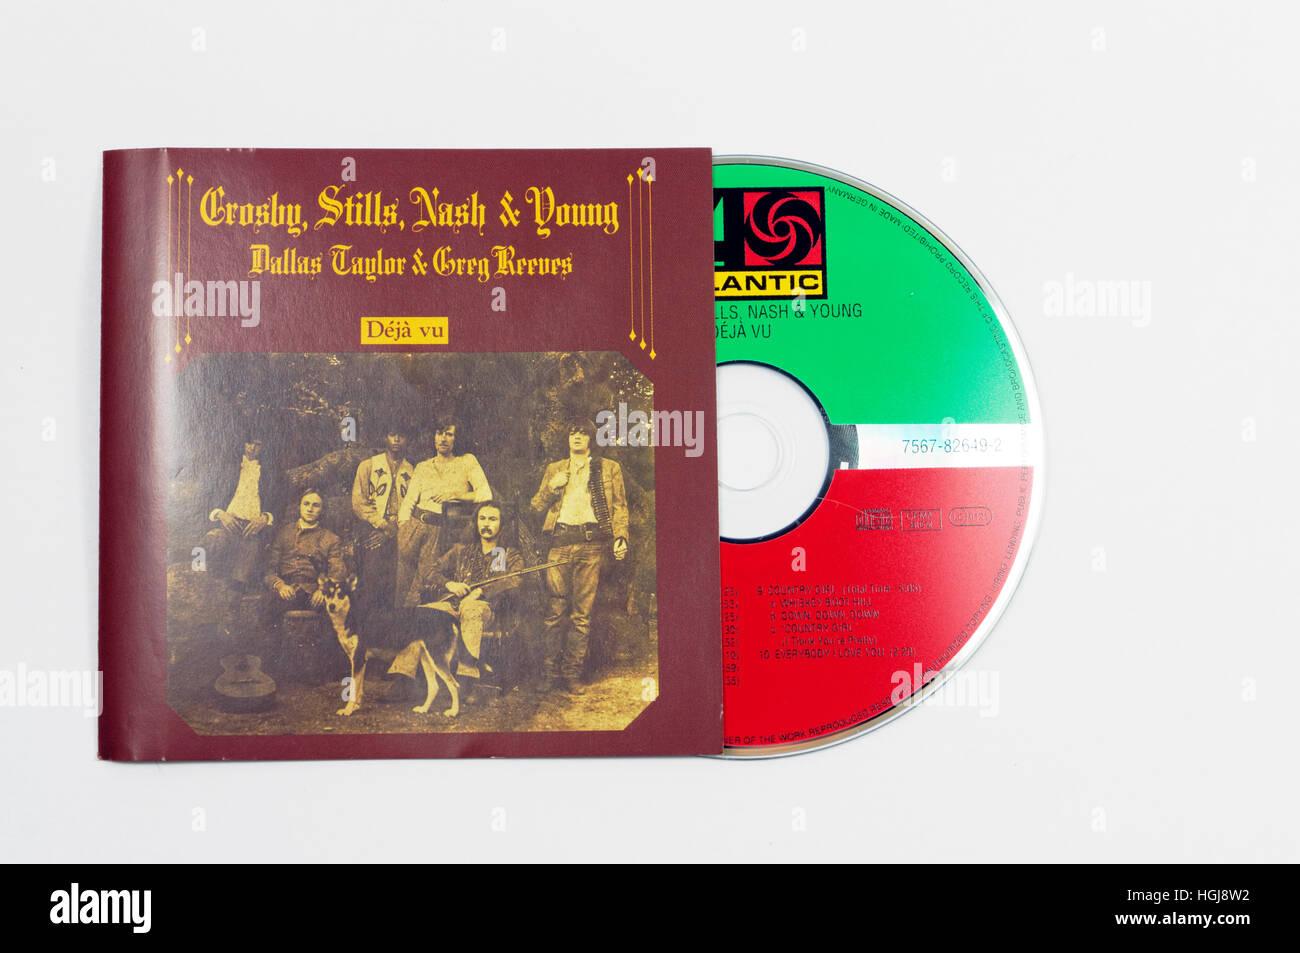 Crosby, Stills, Nash and Young Deja Vu album - Stock Image